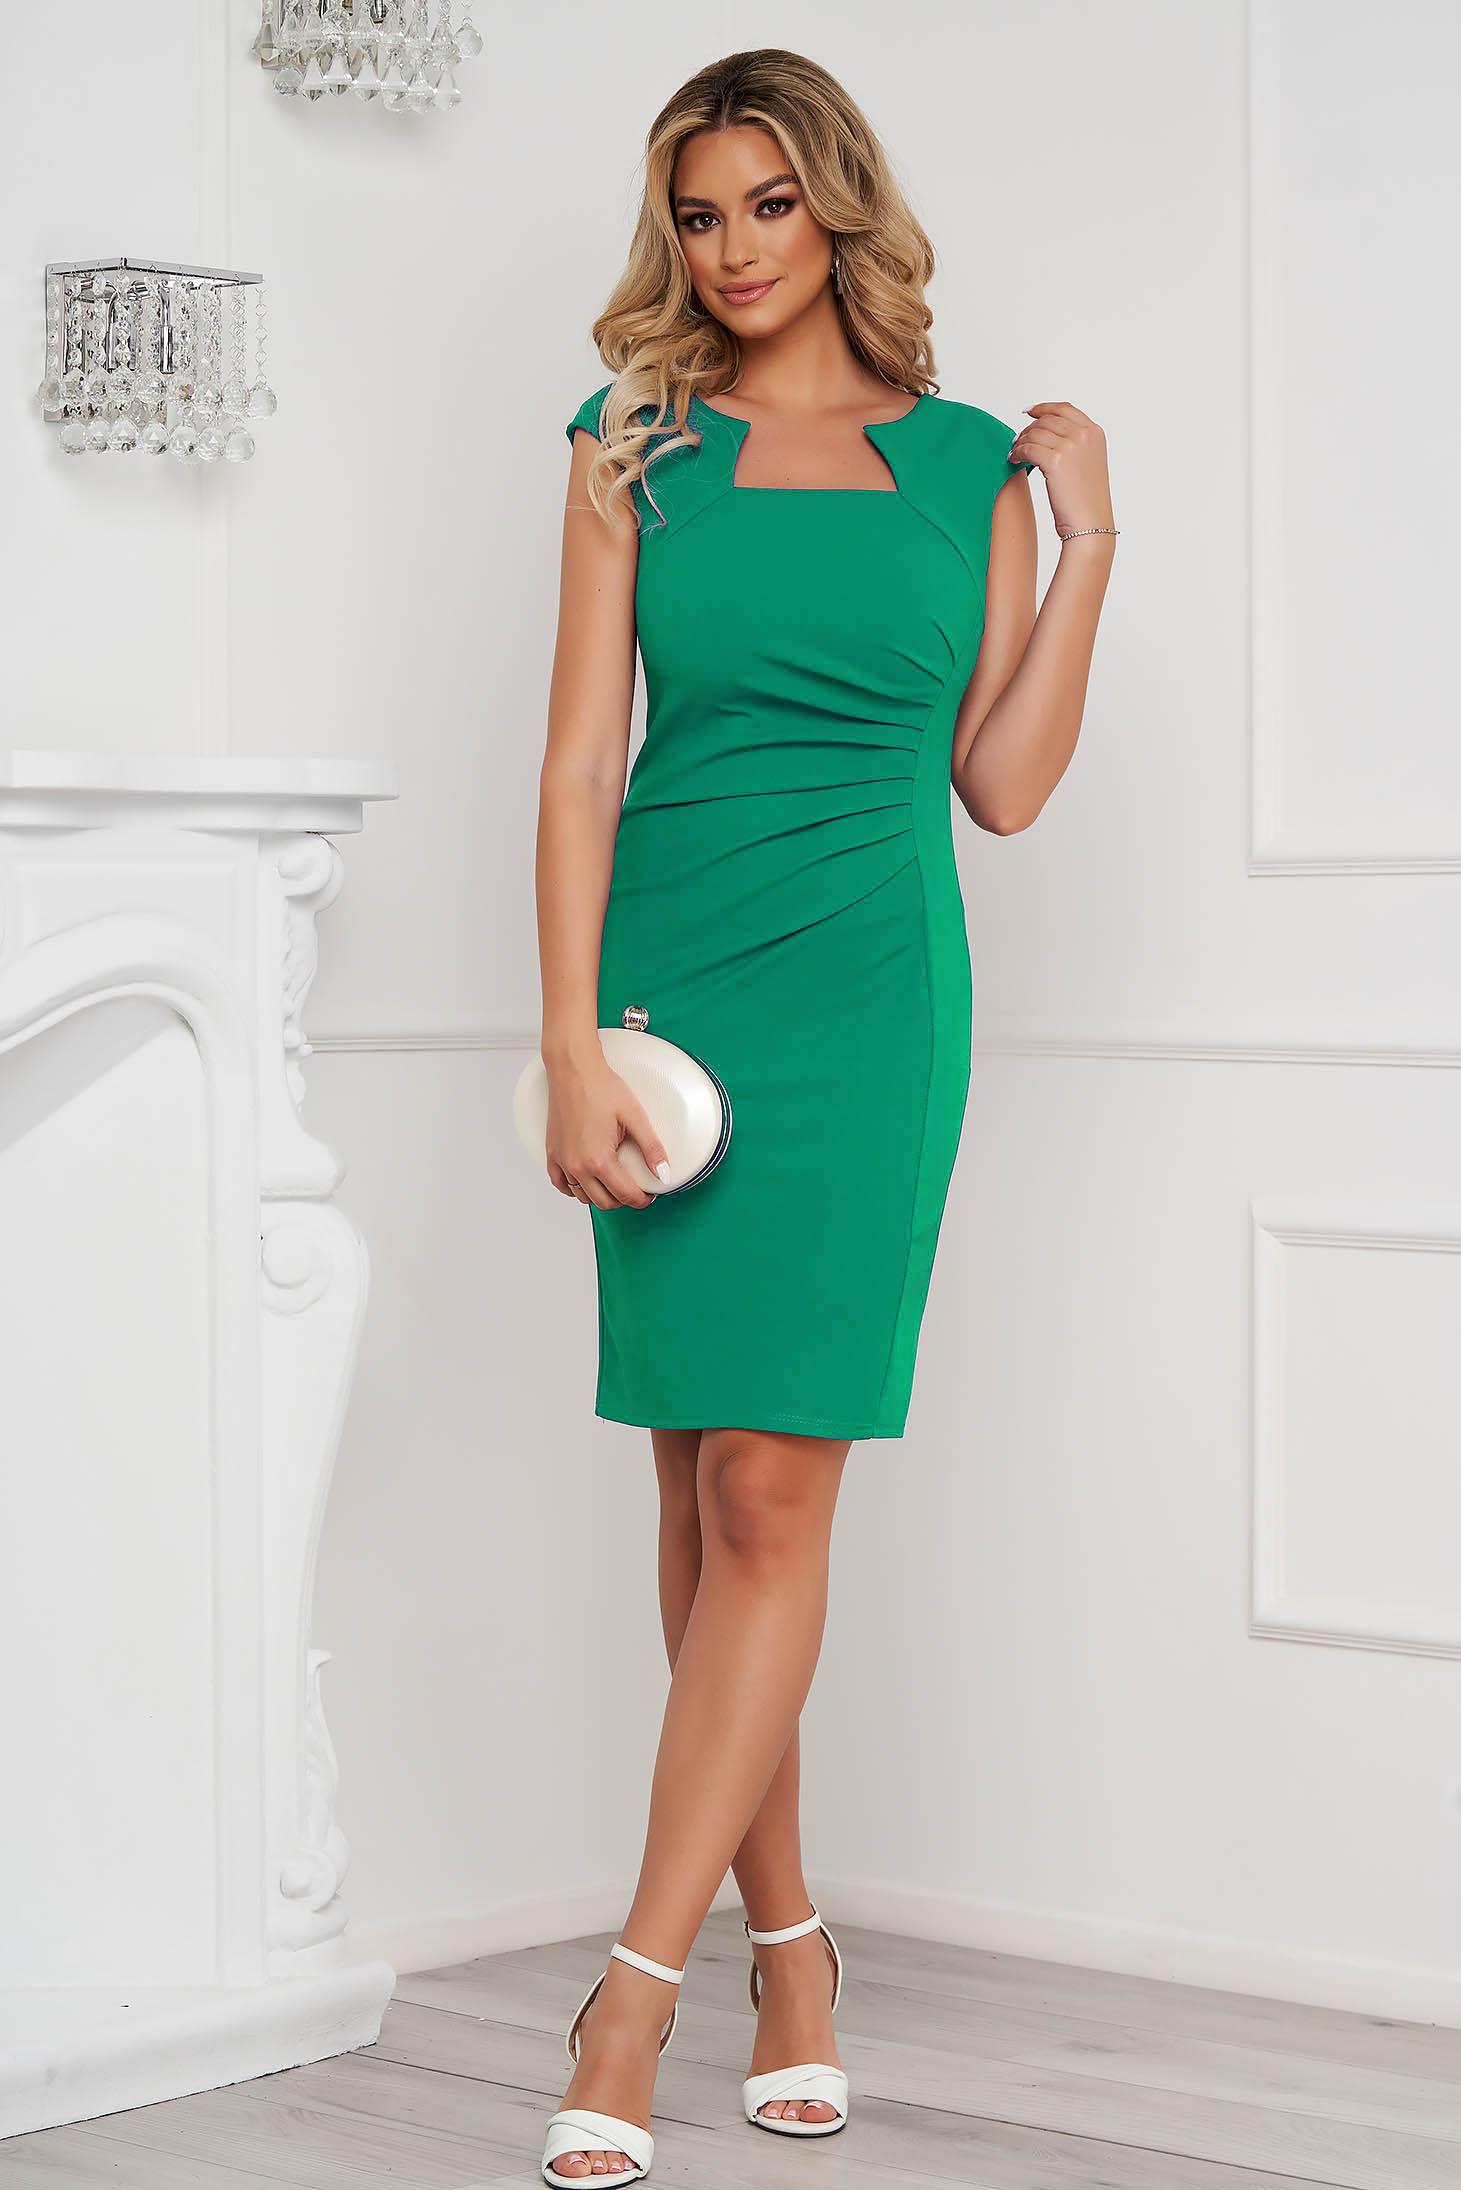 Rövid ujjú zöld rövid irodai ceruza ruha rugalmas anyagból